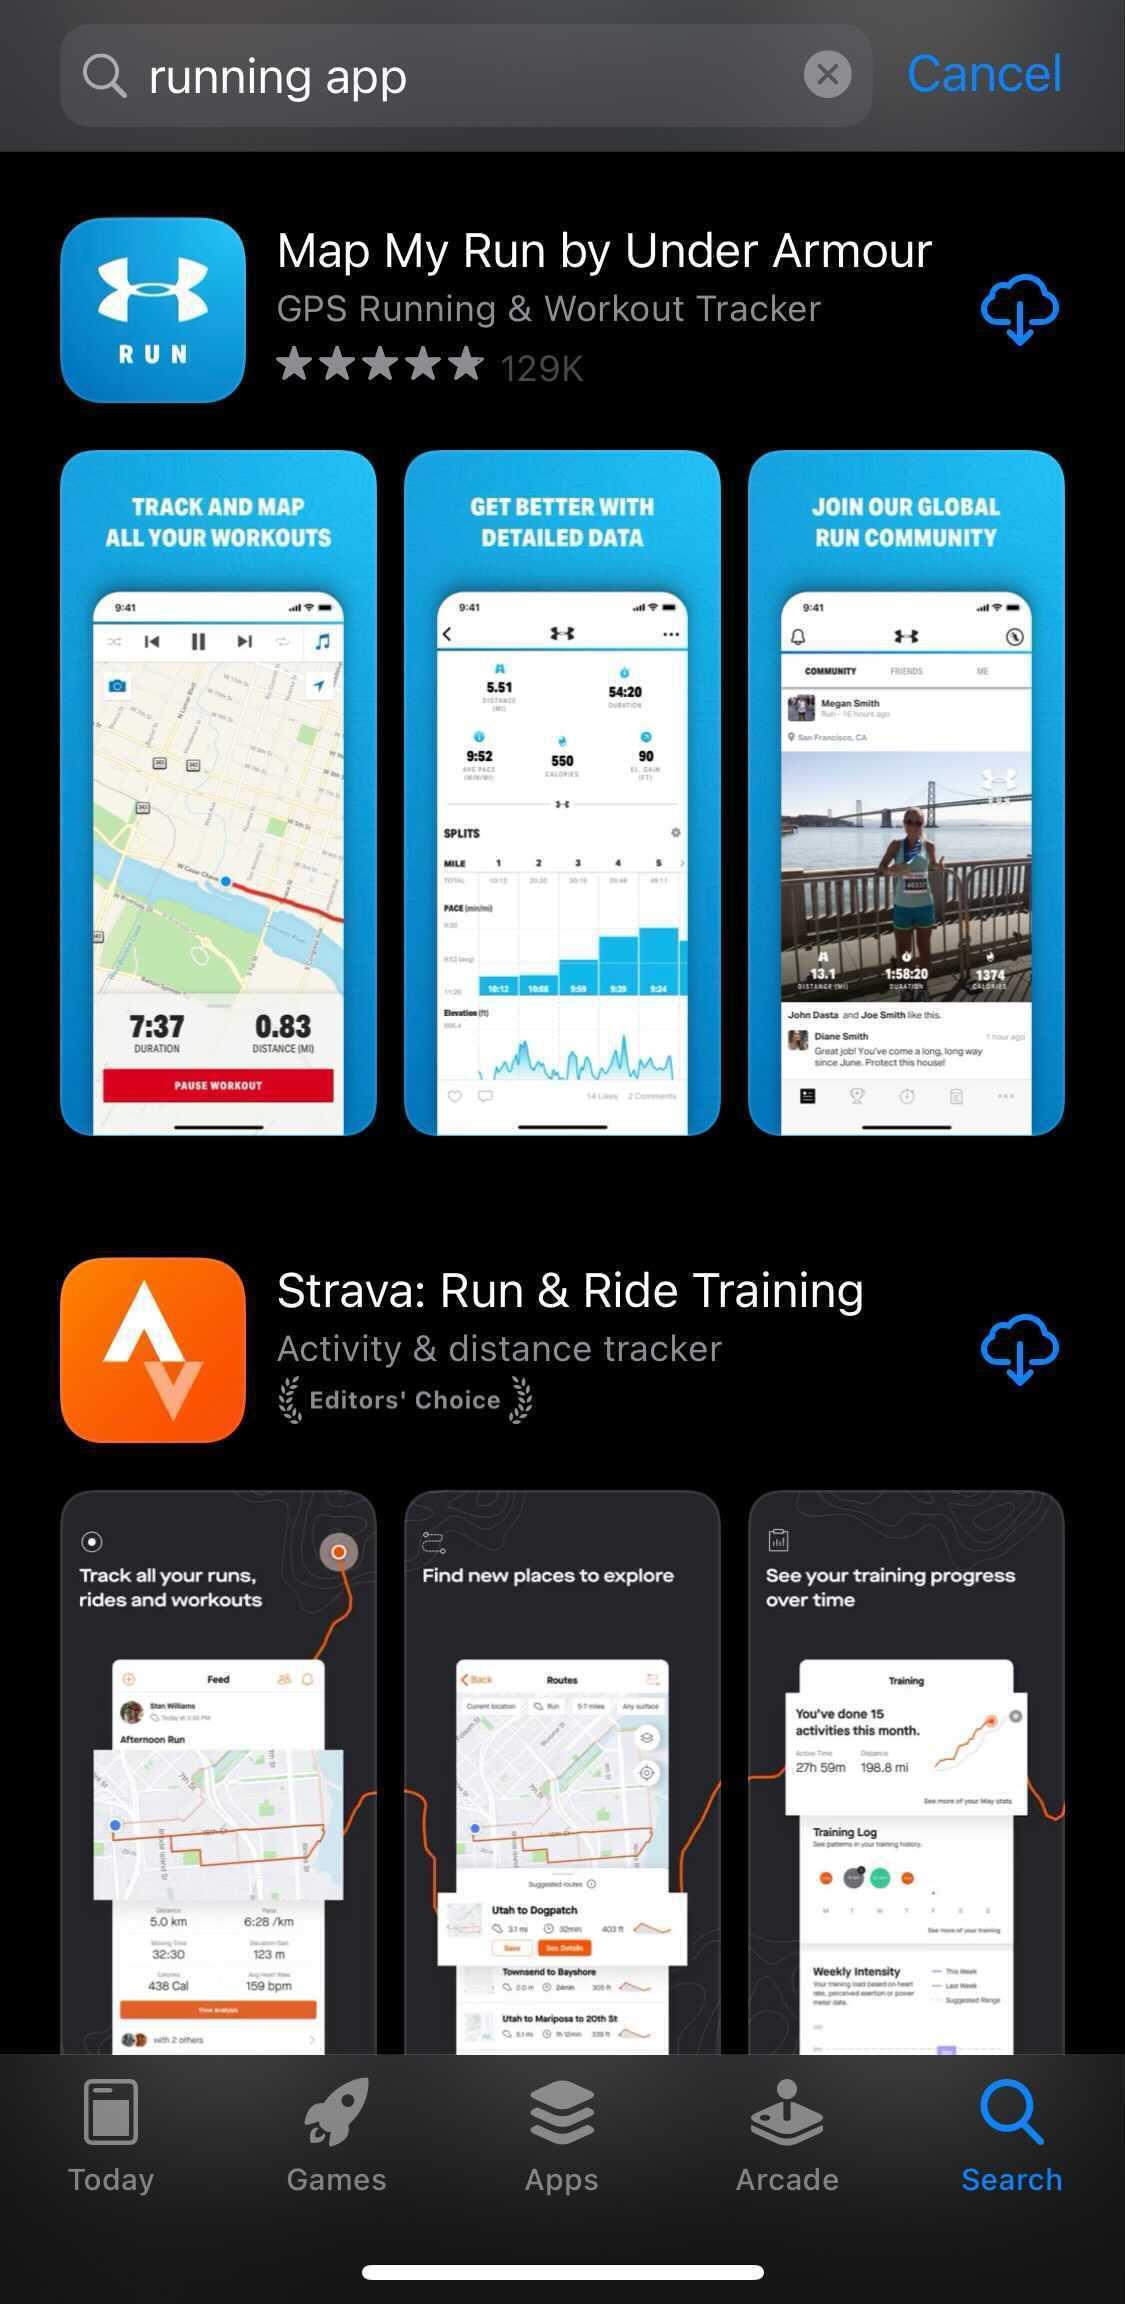 Map My Run App title on iOS